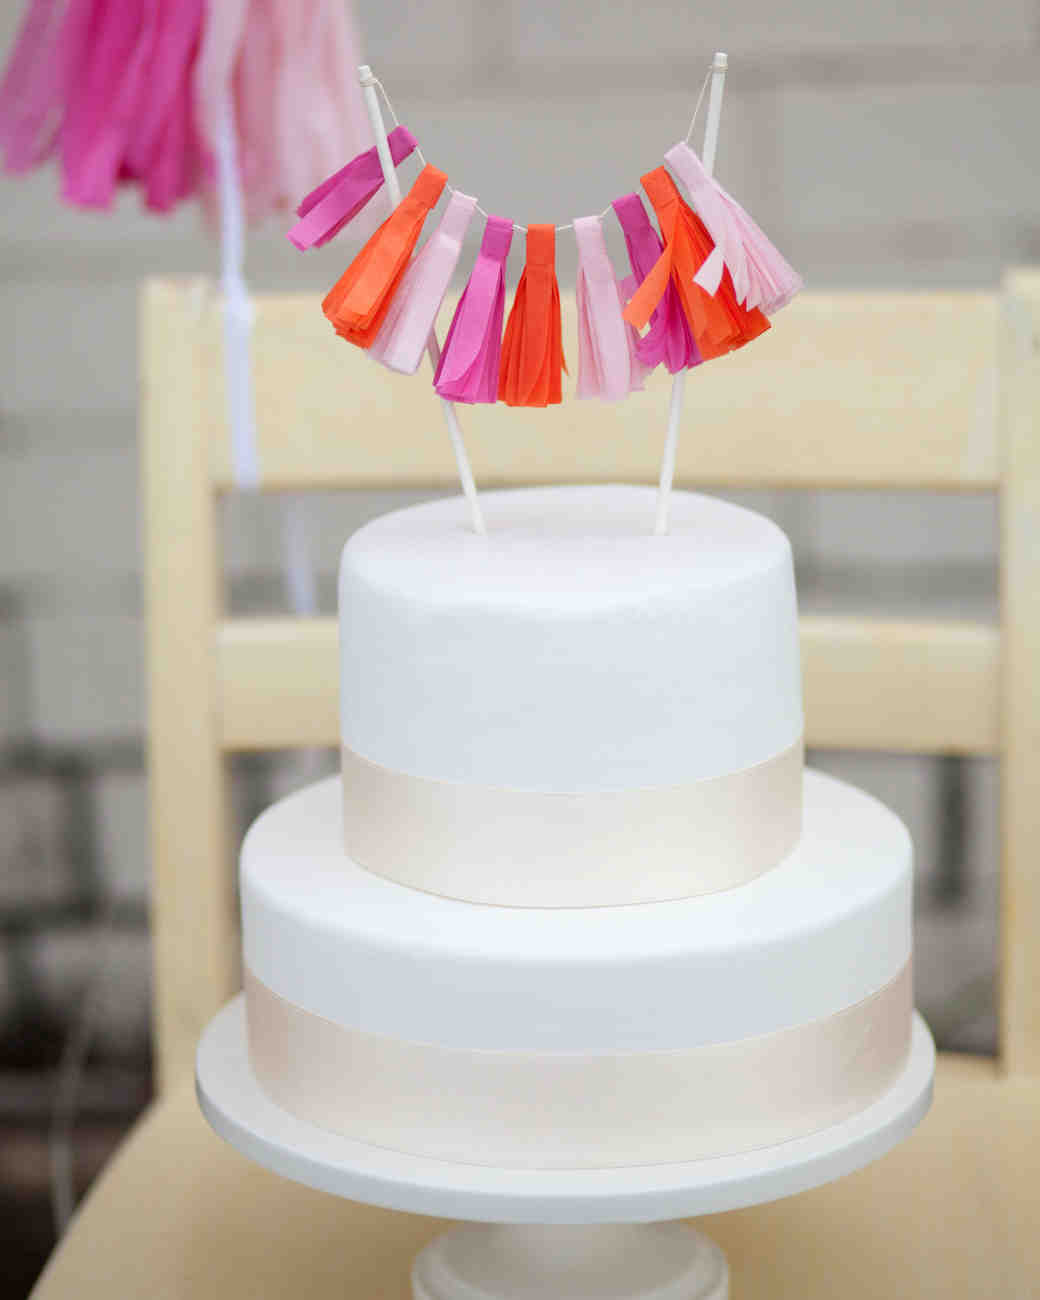 cake-toppers-tucke-and-bonte-pink-tassel-0814.jpg